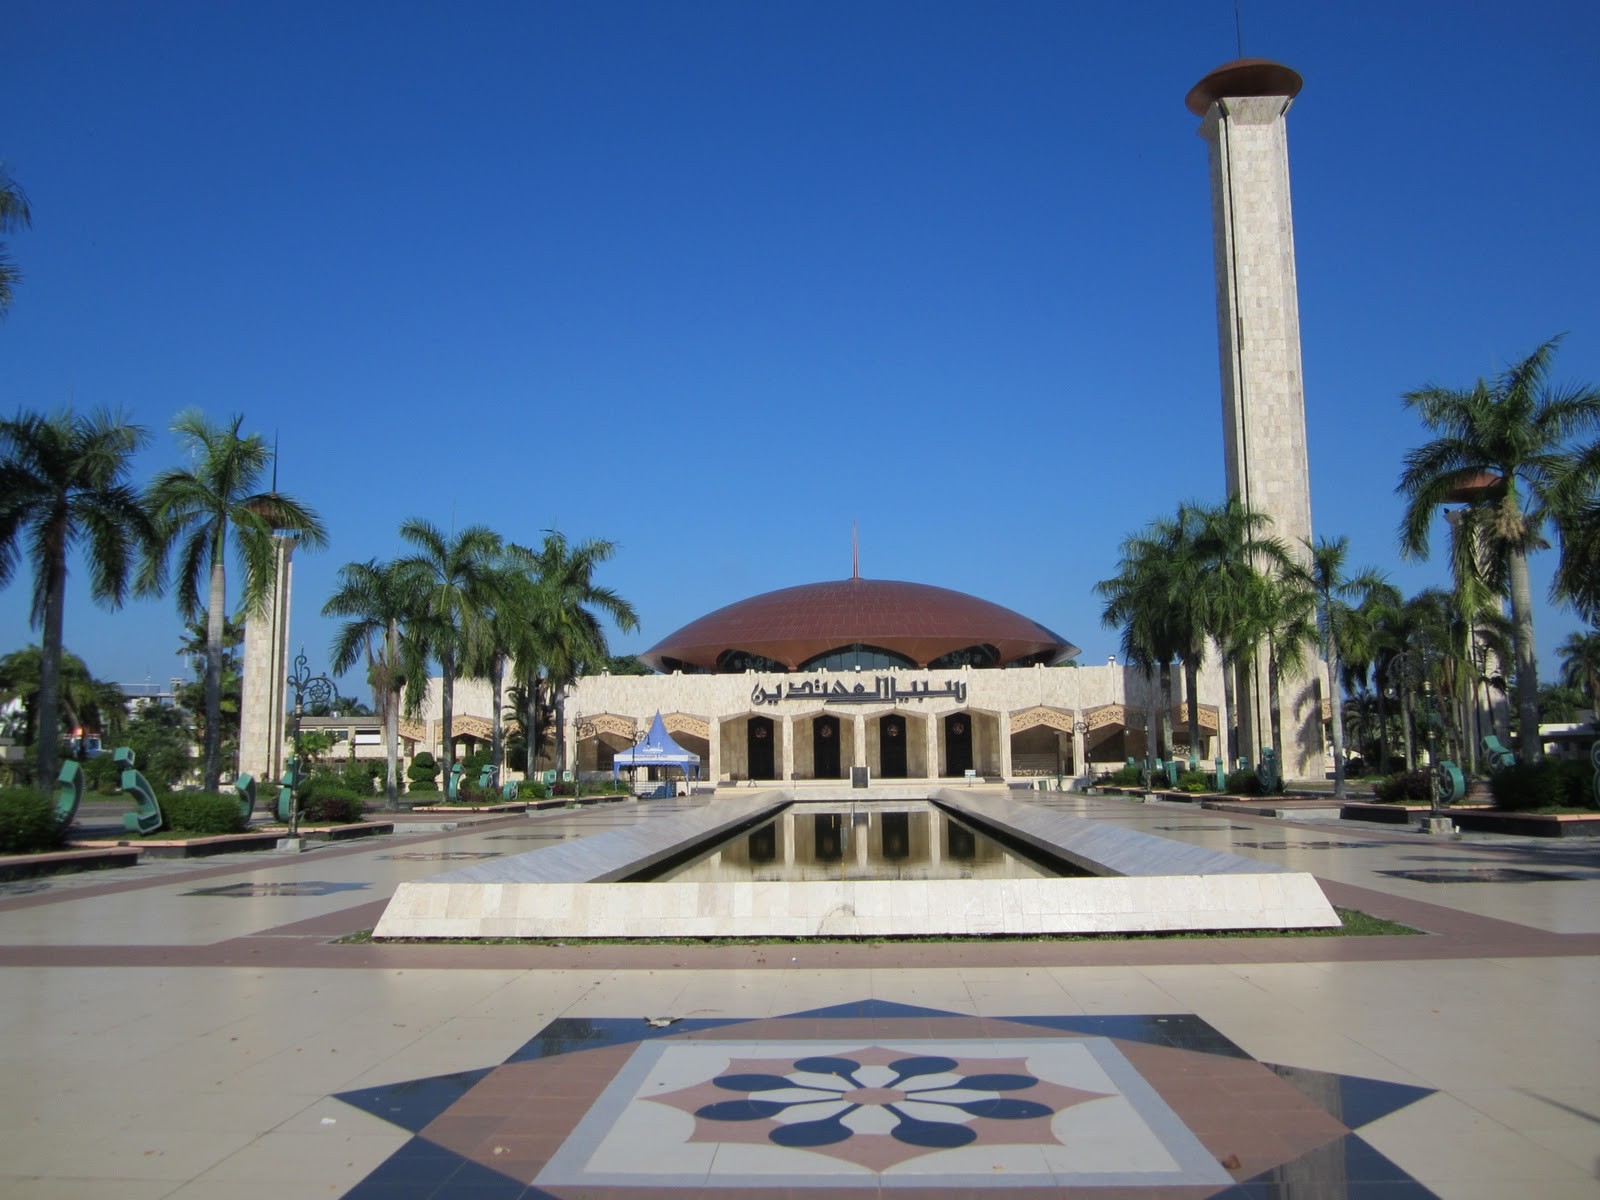 tempat wisata wisata kalimantan selatan masjid sahbilal muhtadin